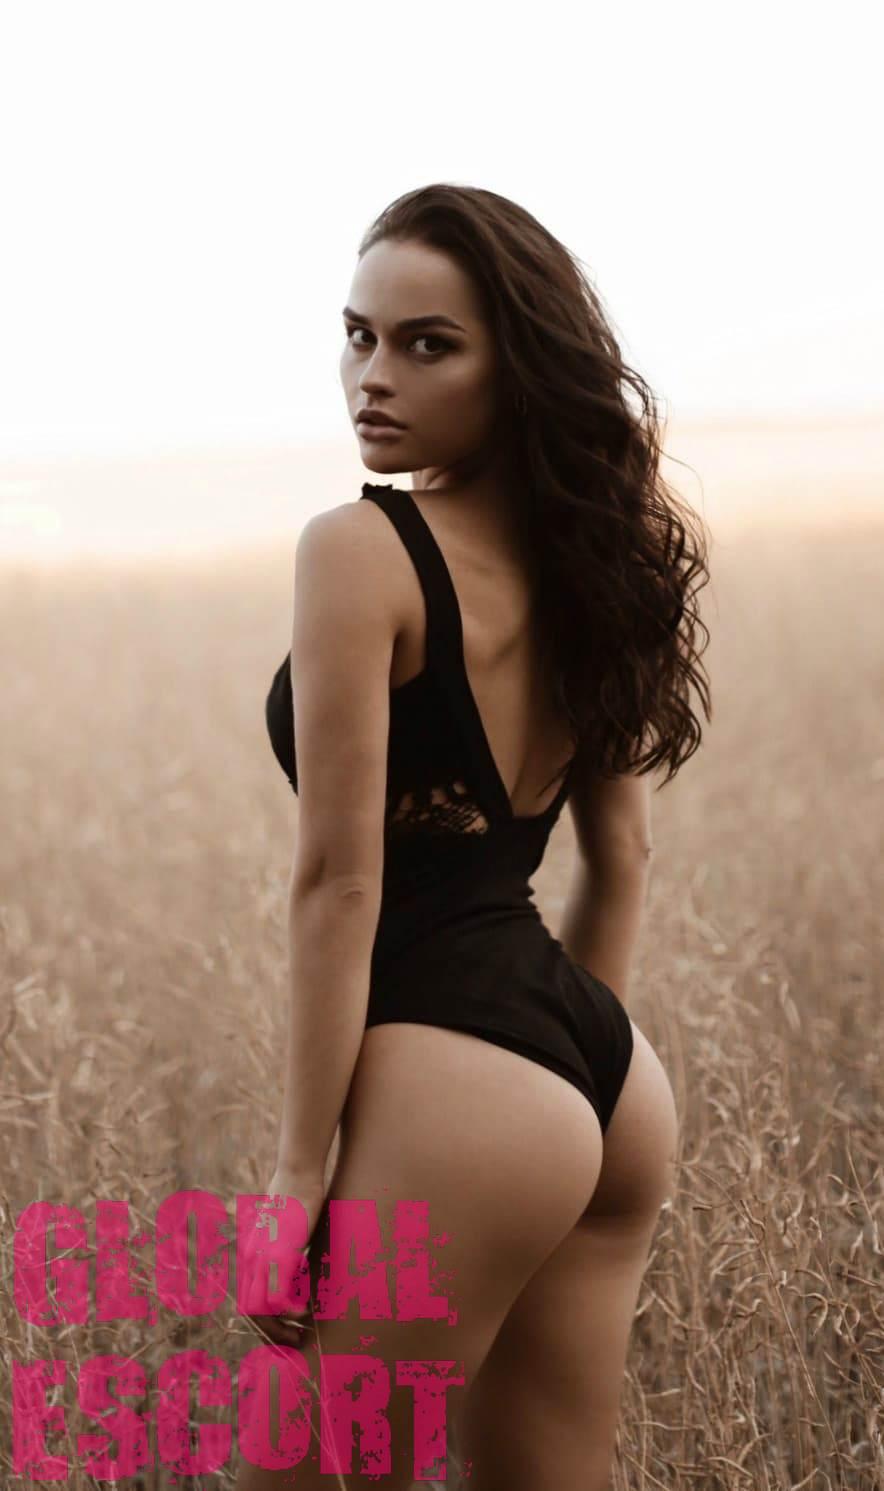 Sexy brunette Sofia in a black swimsuit in a field